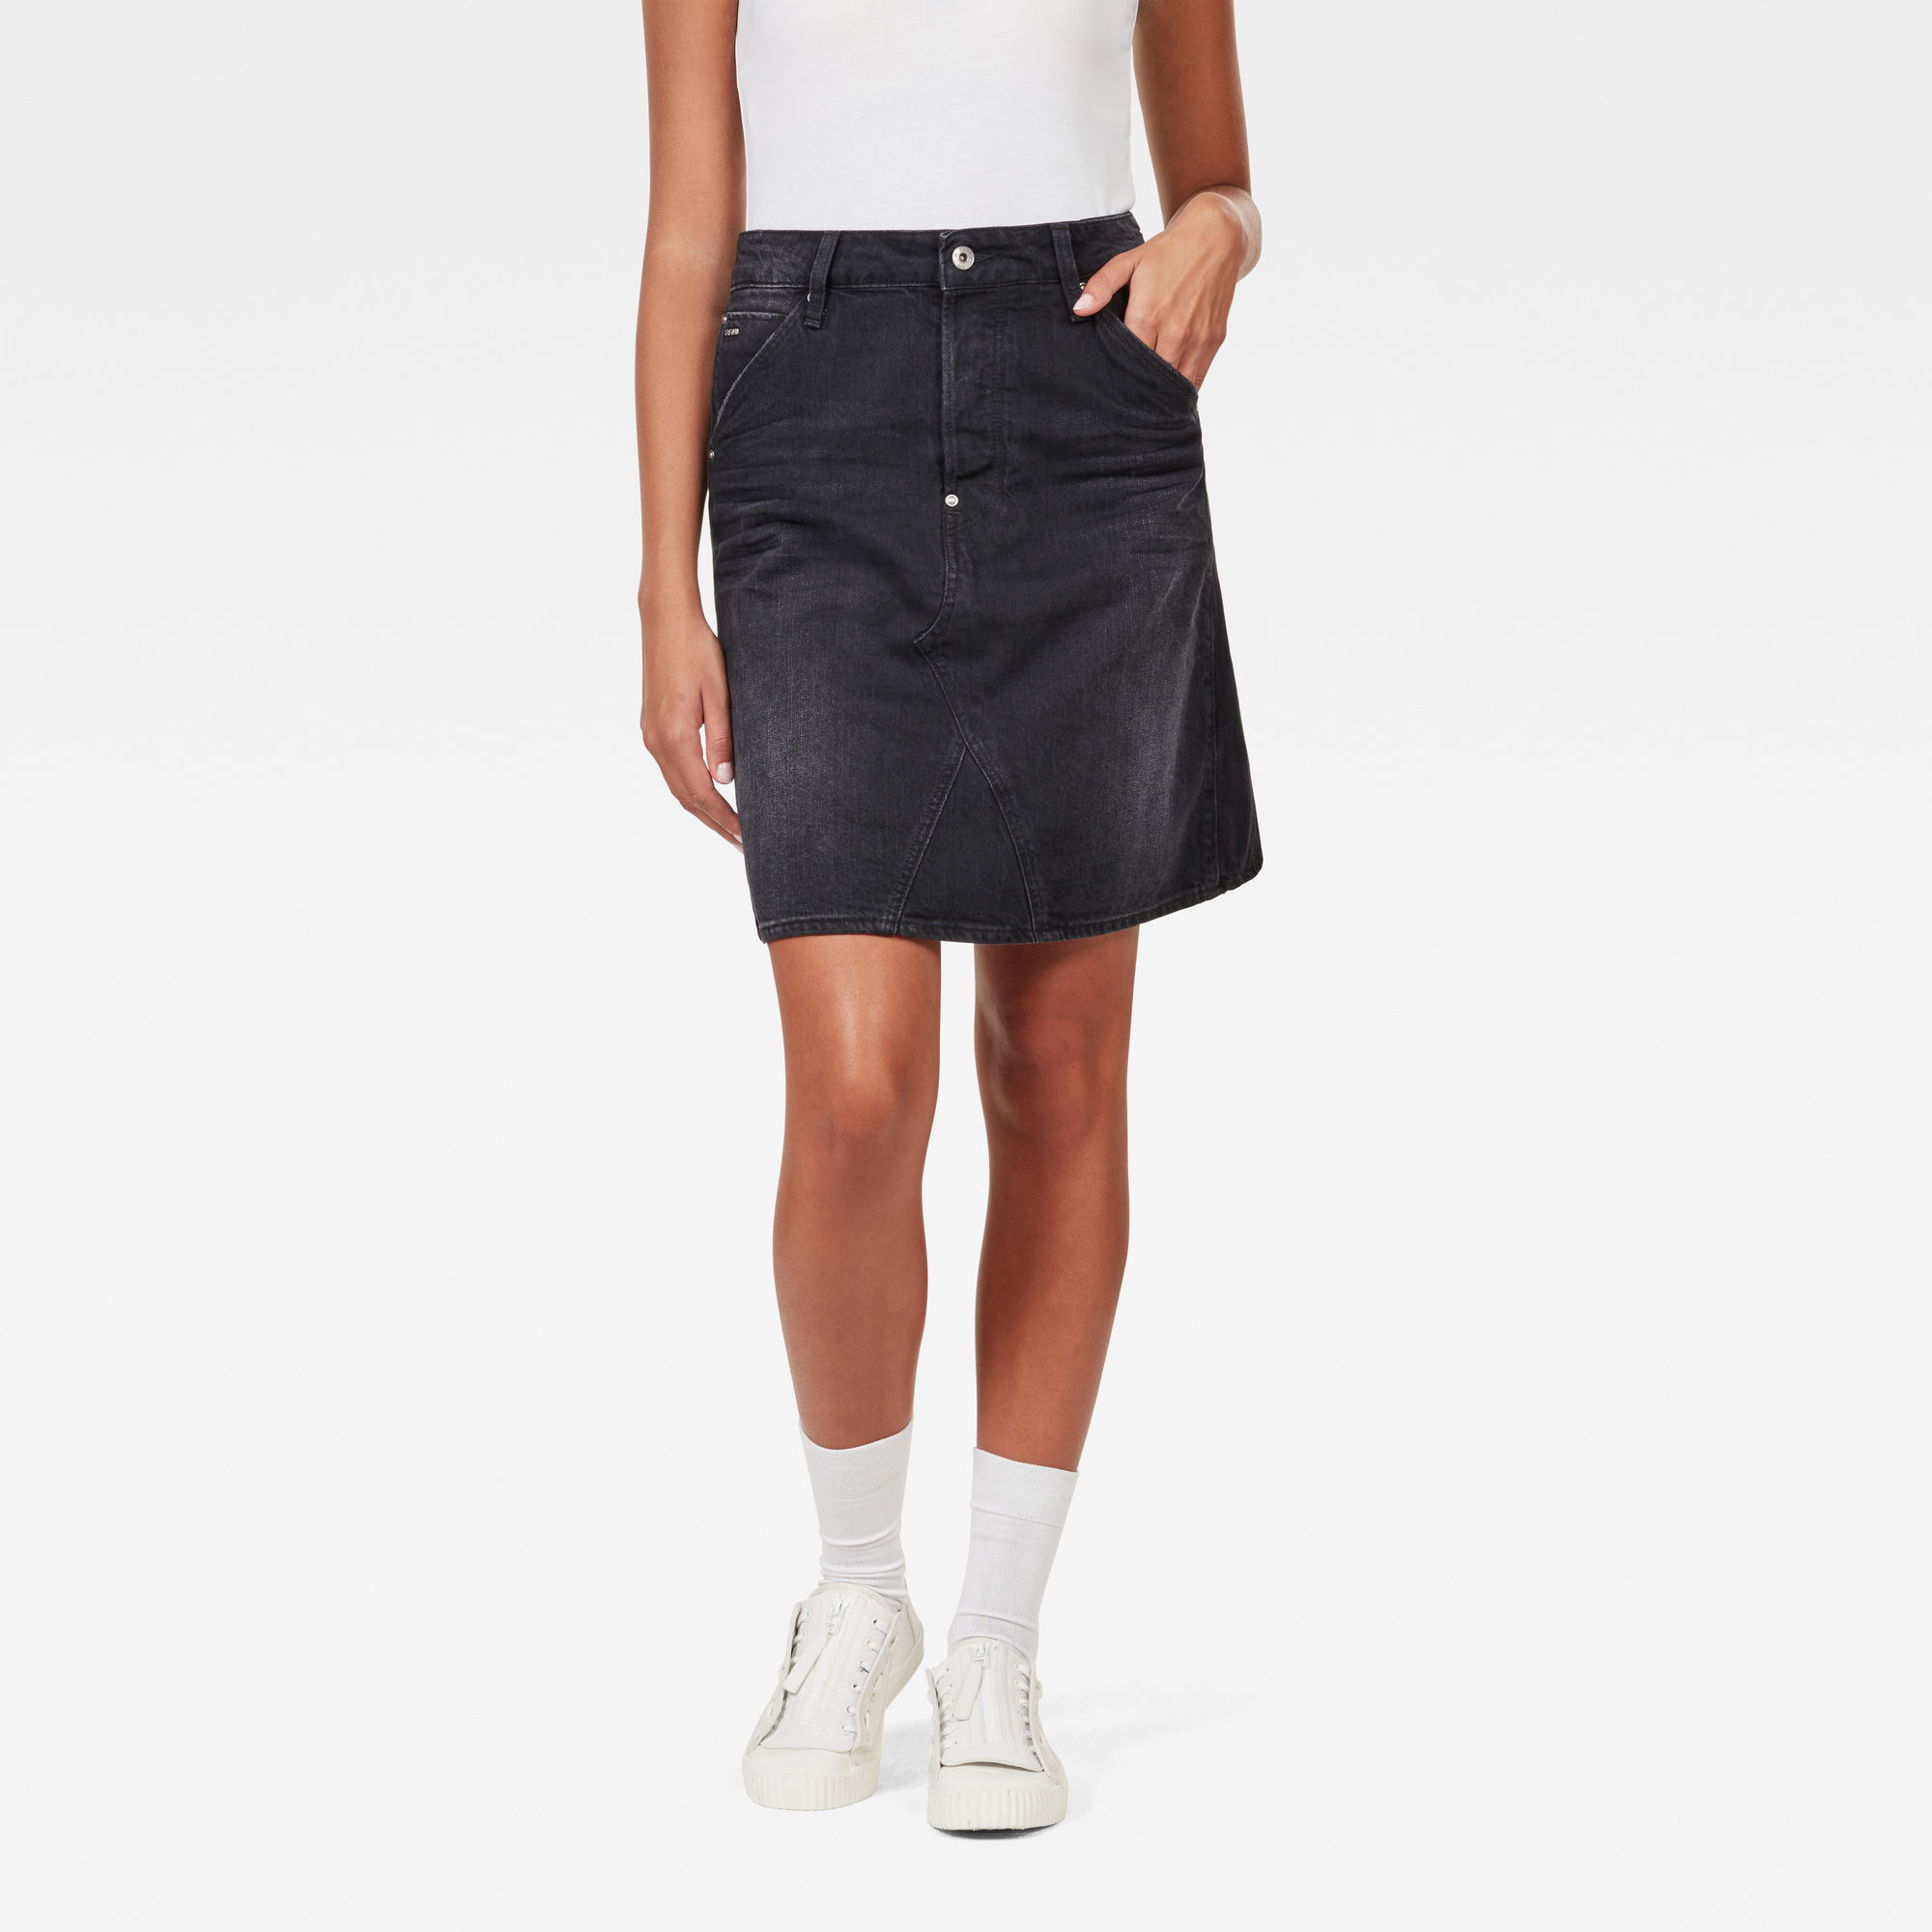 Image of 5622 Skirt